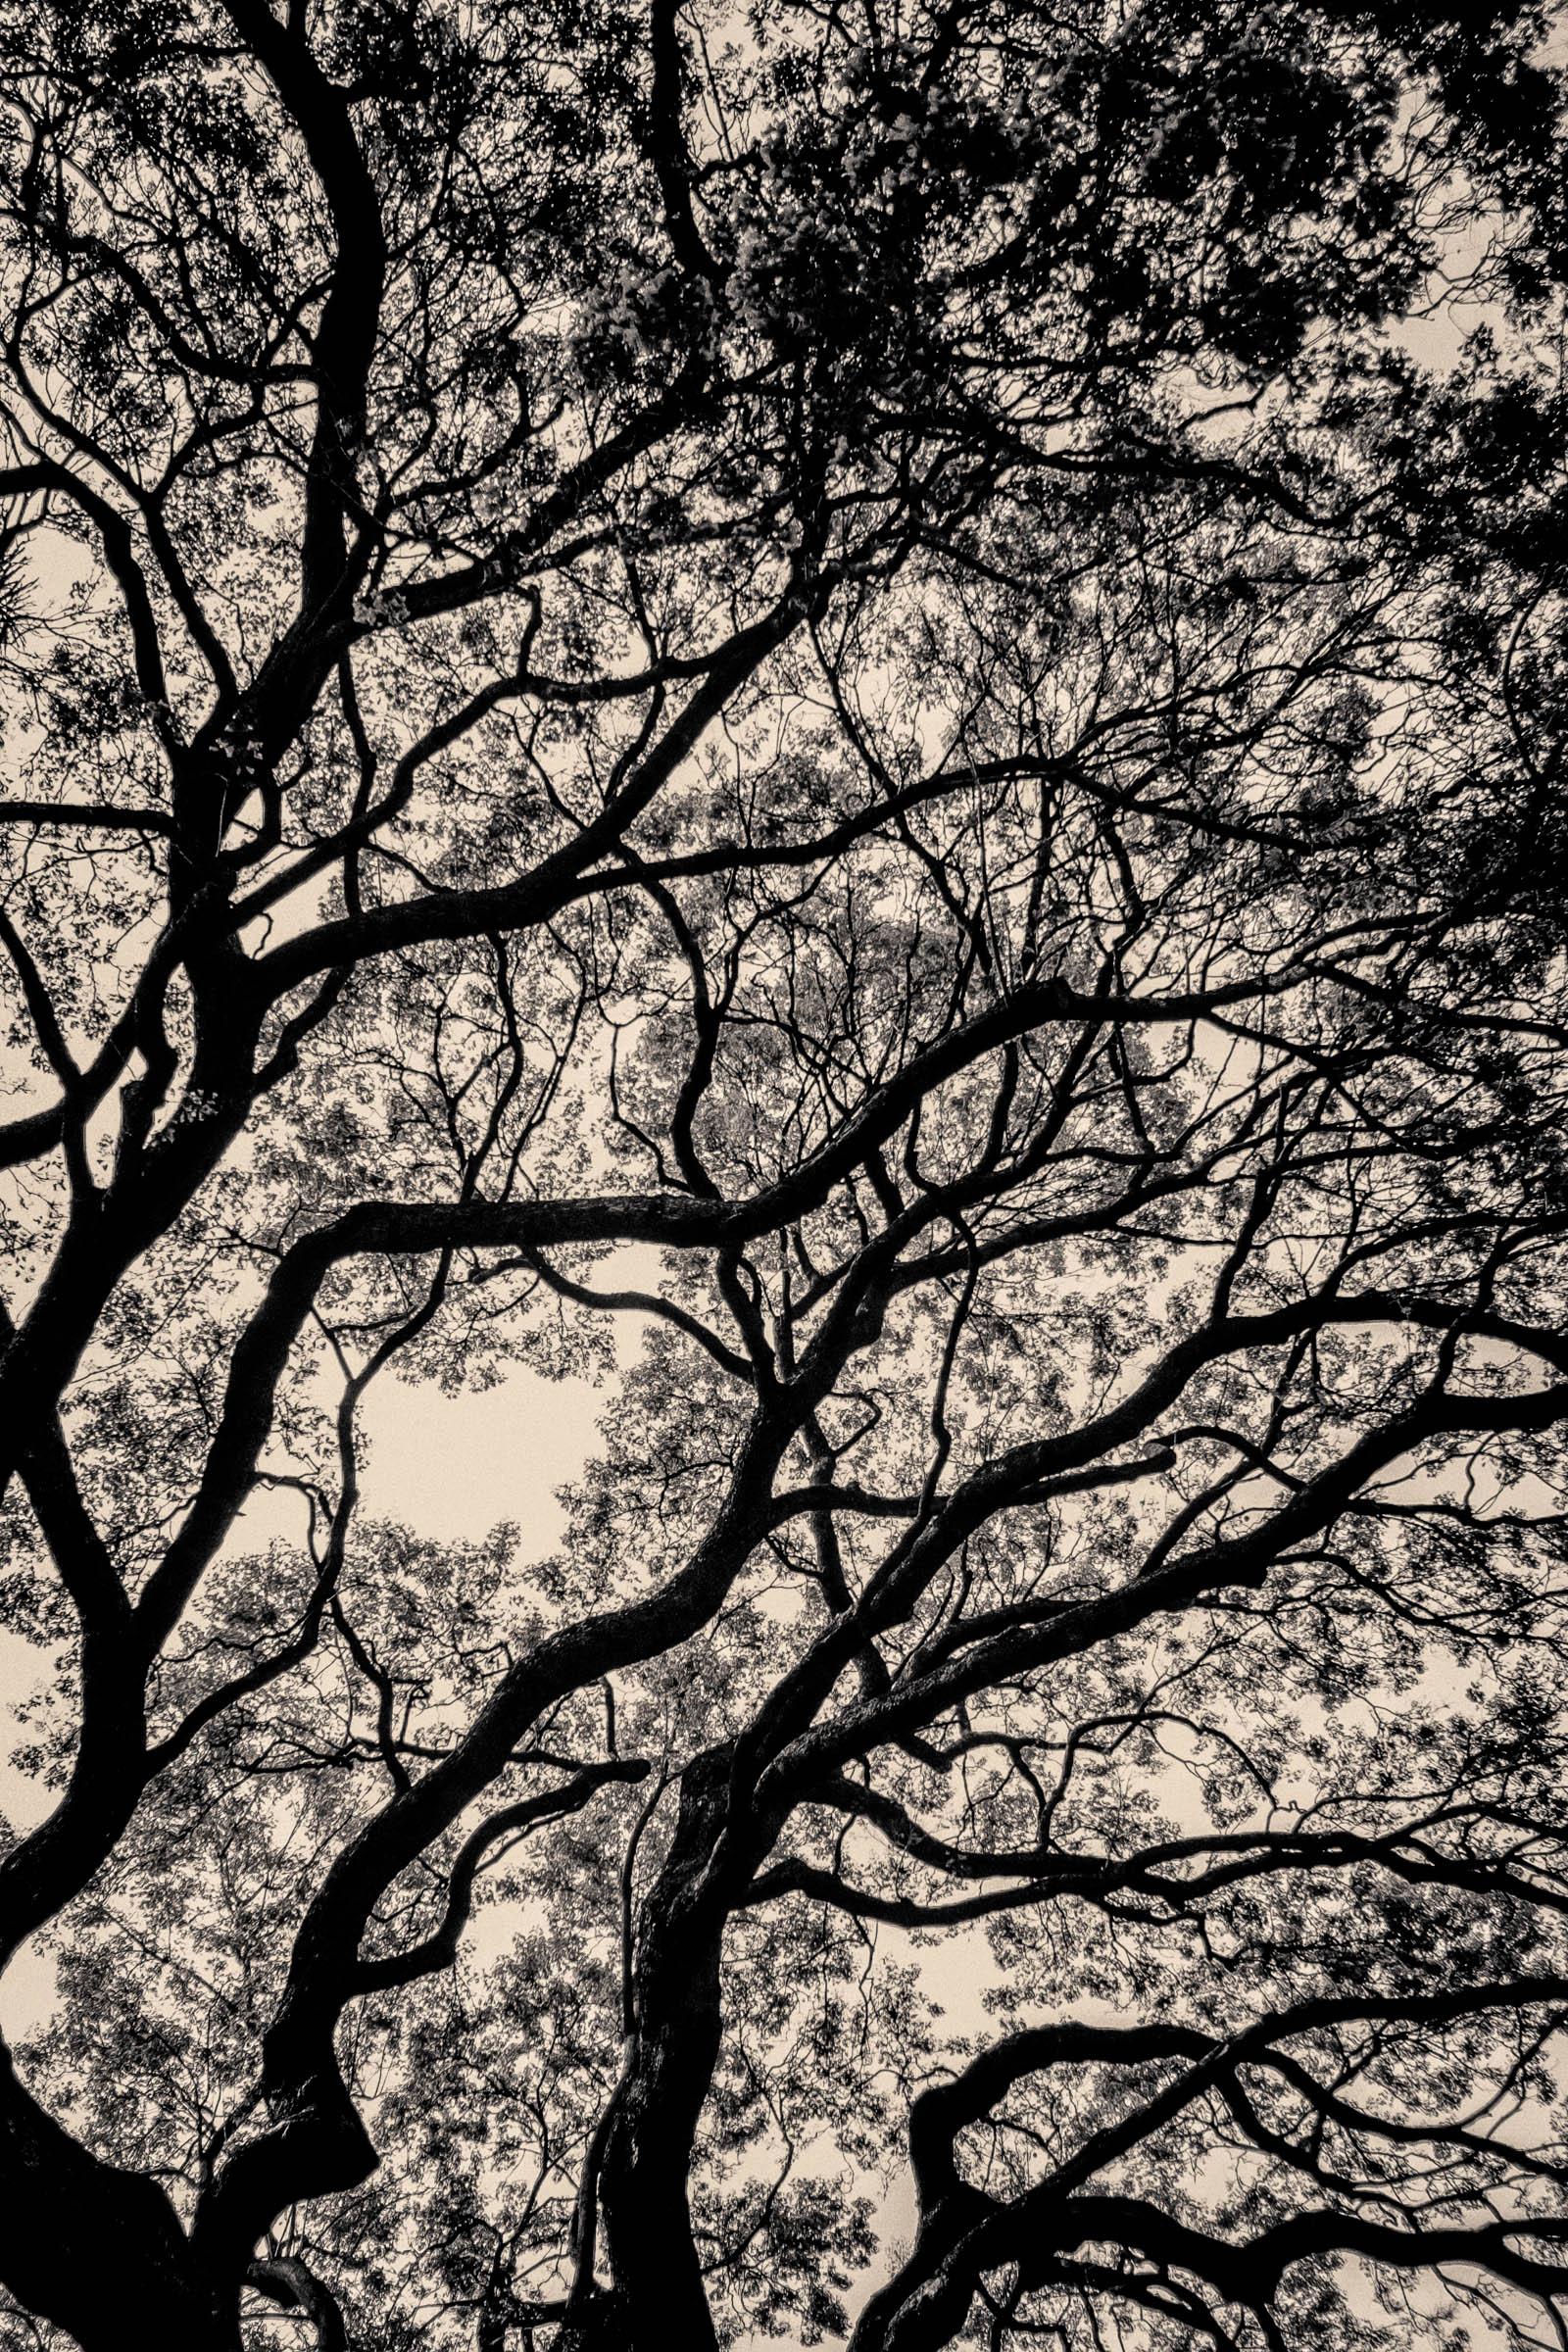 Zimbabwean tree